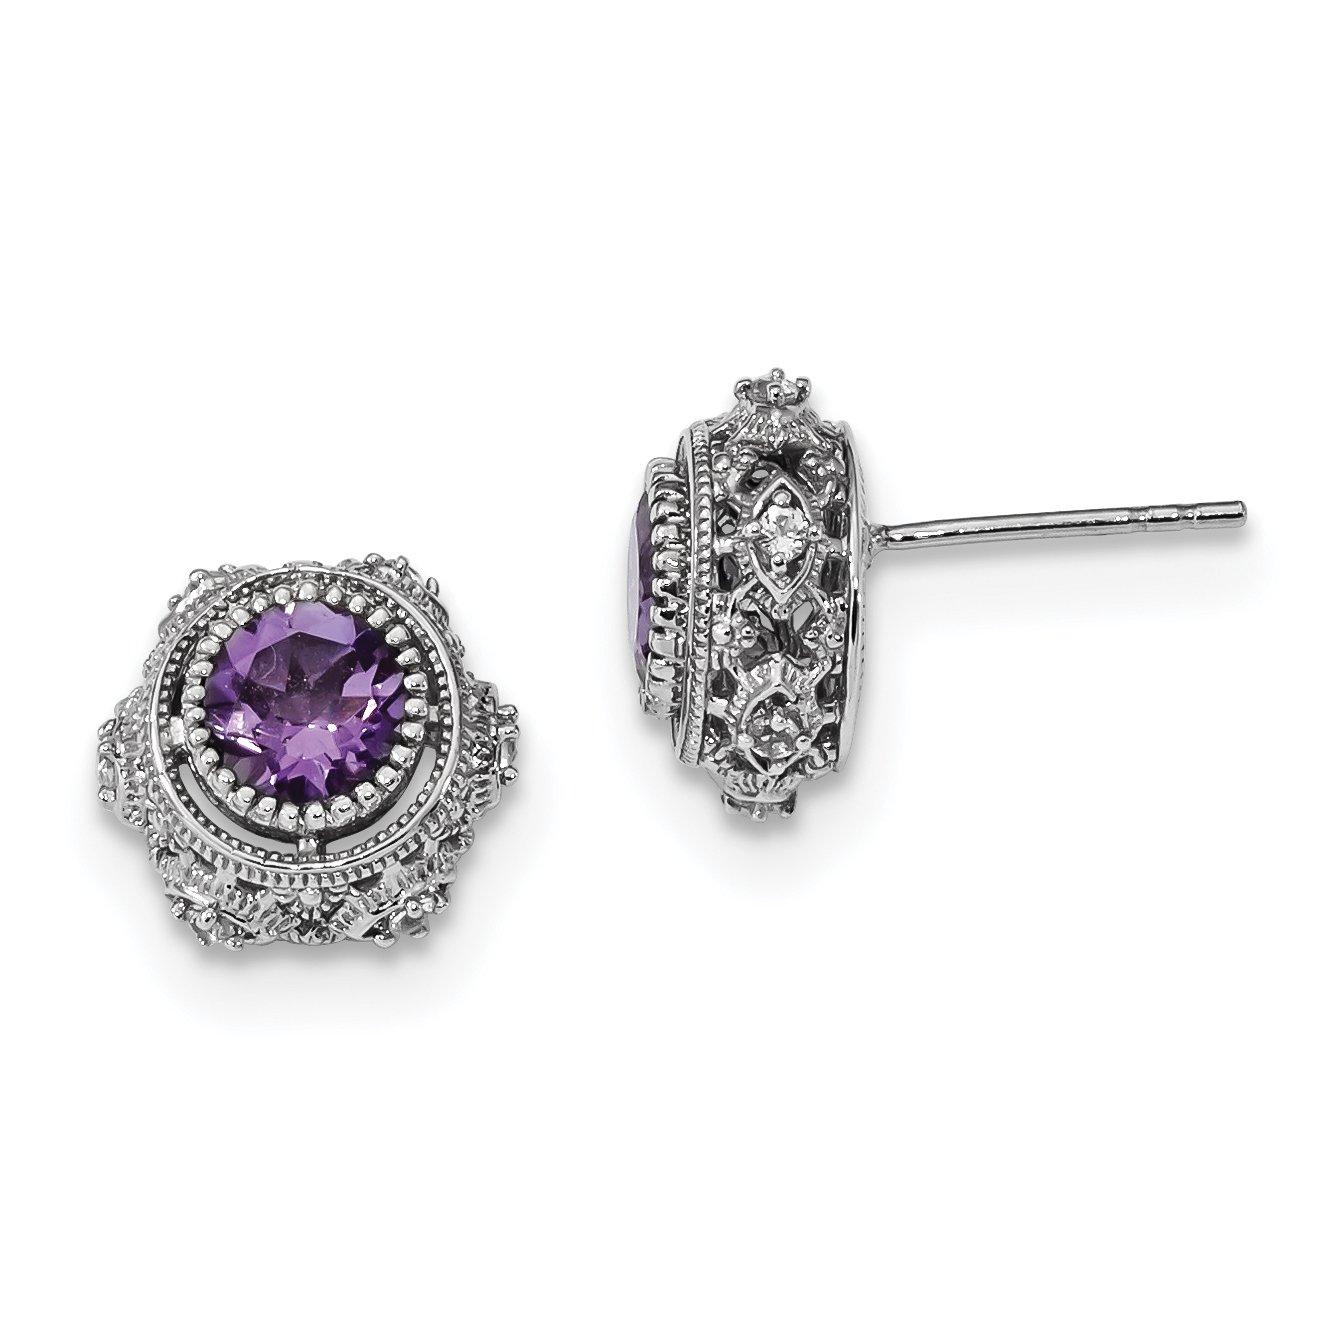 ICE CARATS 925 Sterling Silver Purple Amethyst White Topaz Post Stud Ball Button Earrings Fine Jewelry Gift Set For Women Heart